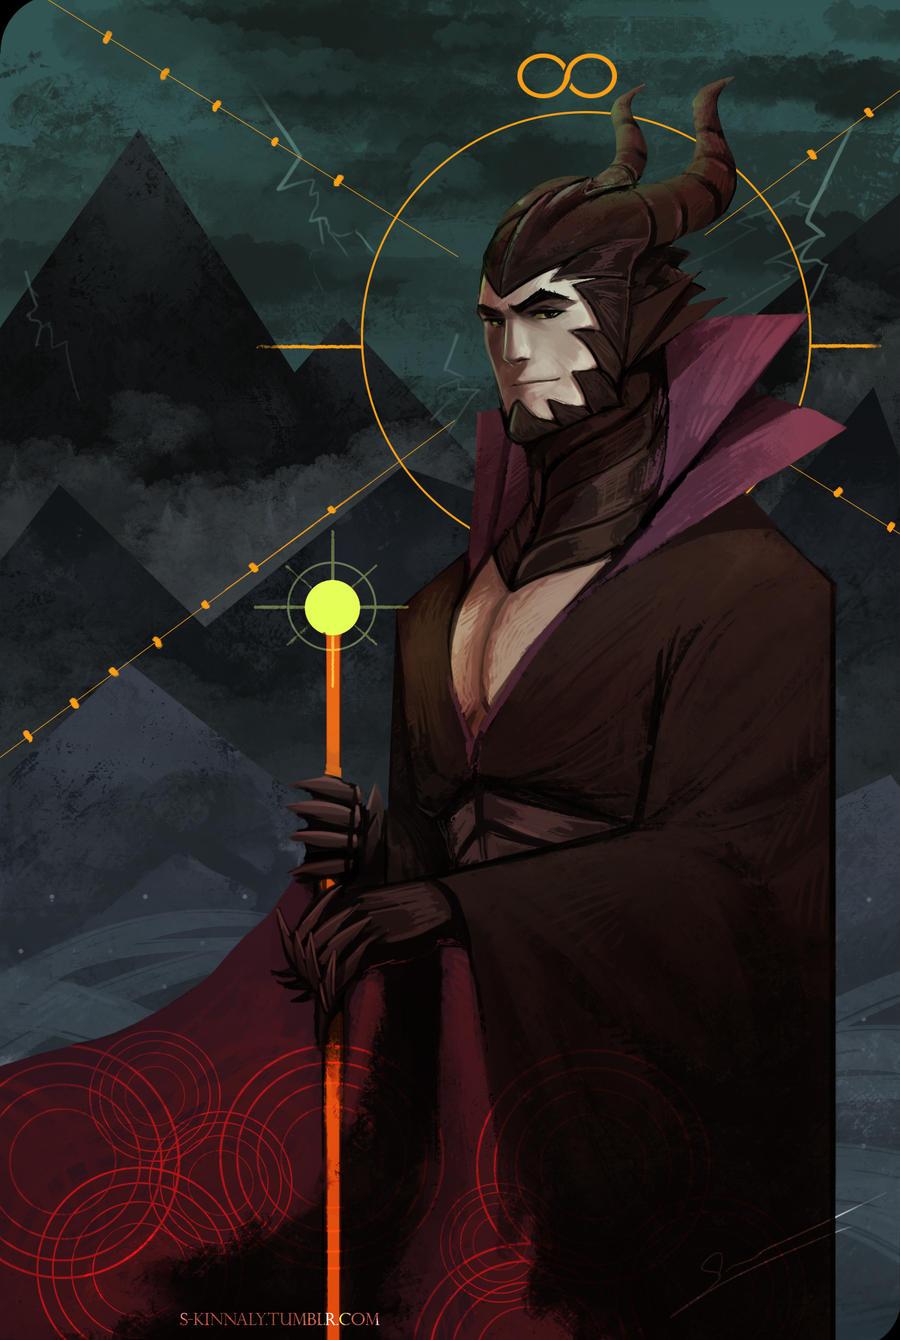 Maleficent Tarot Card By S-Kinnaly On DeviantArt